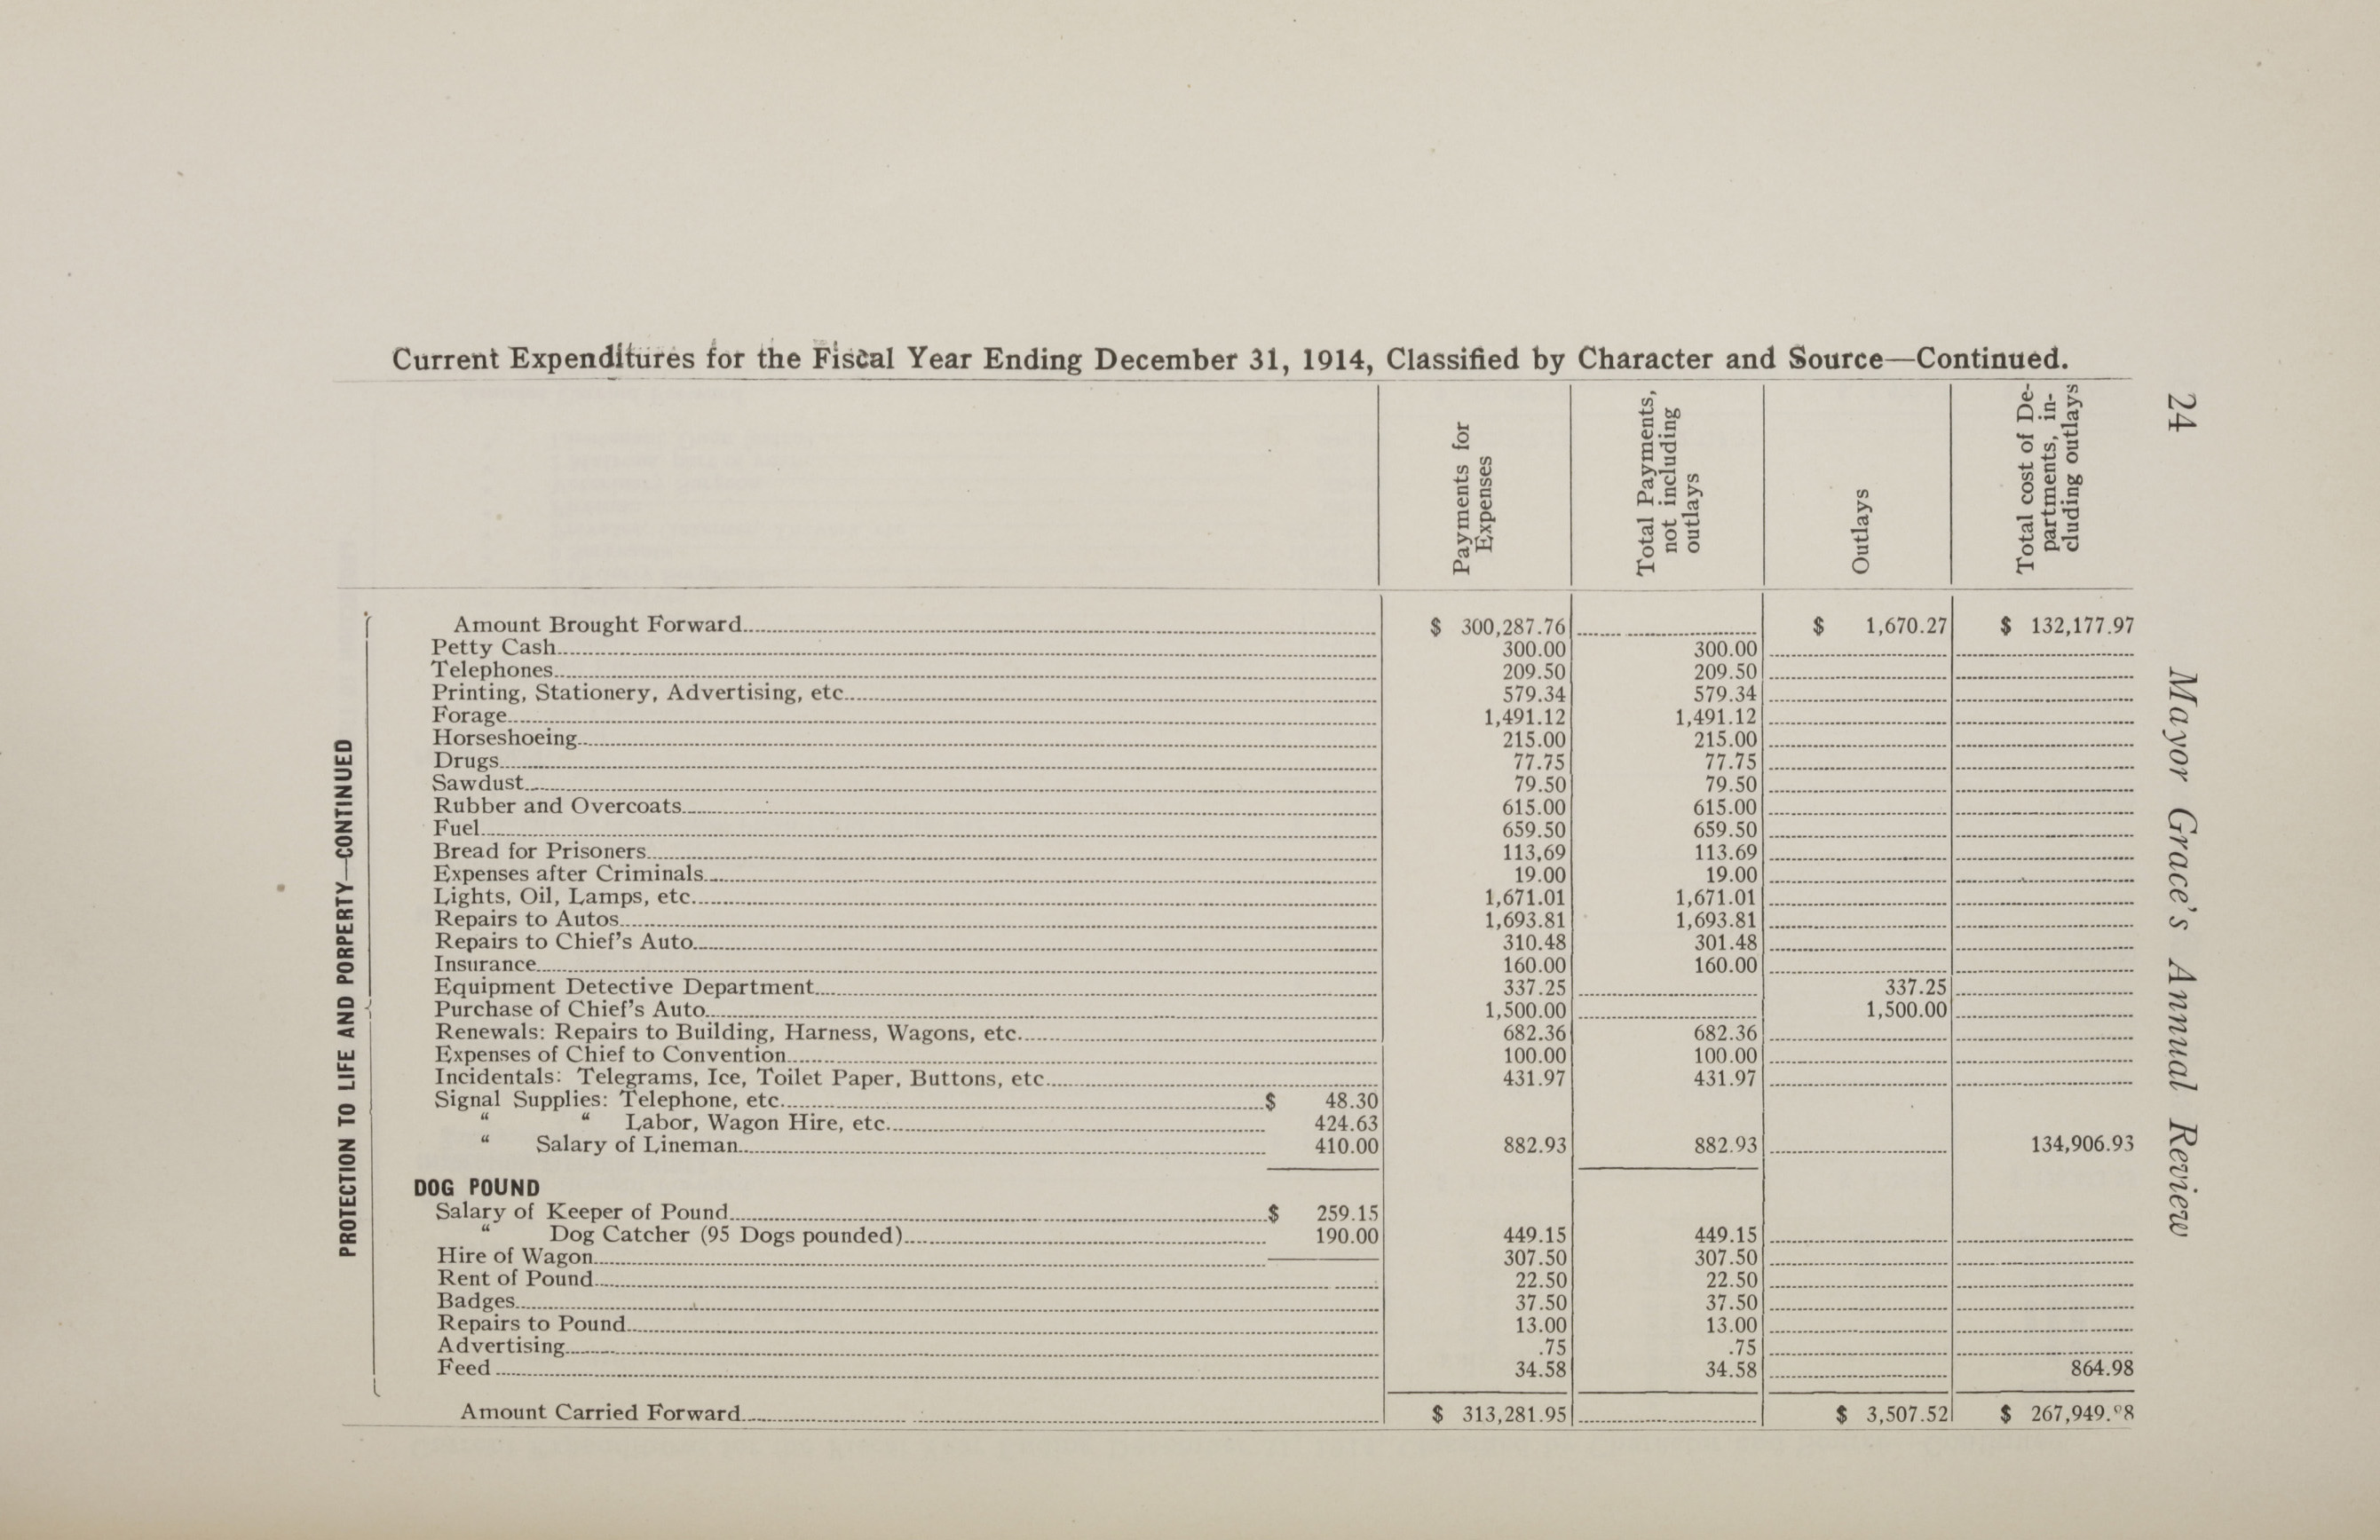 Charleston Yearbook, 1914, page 24